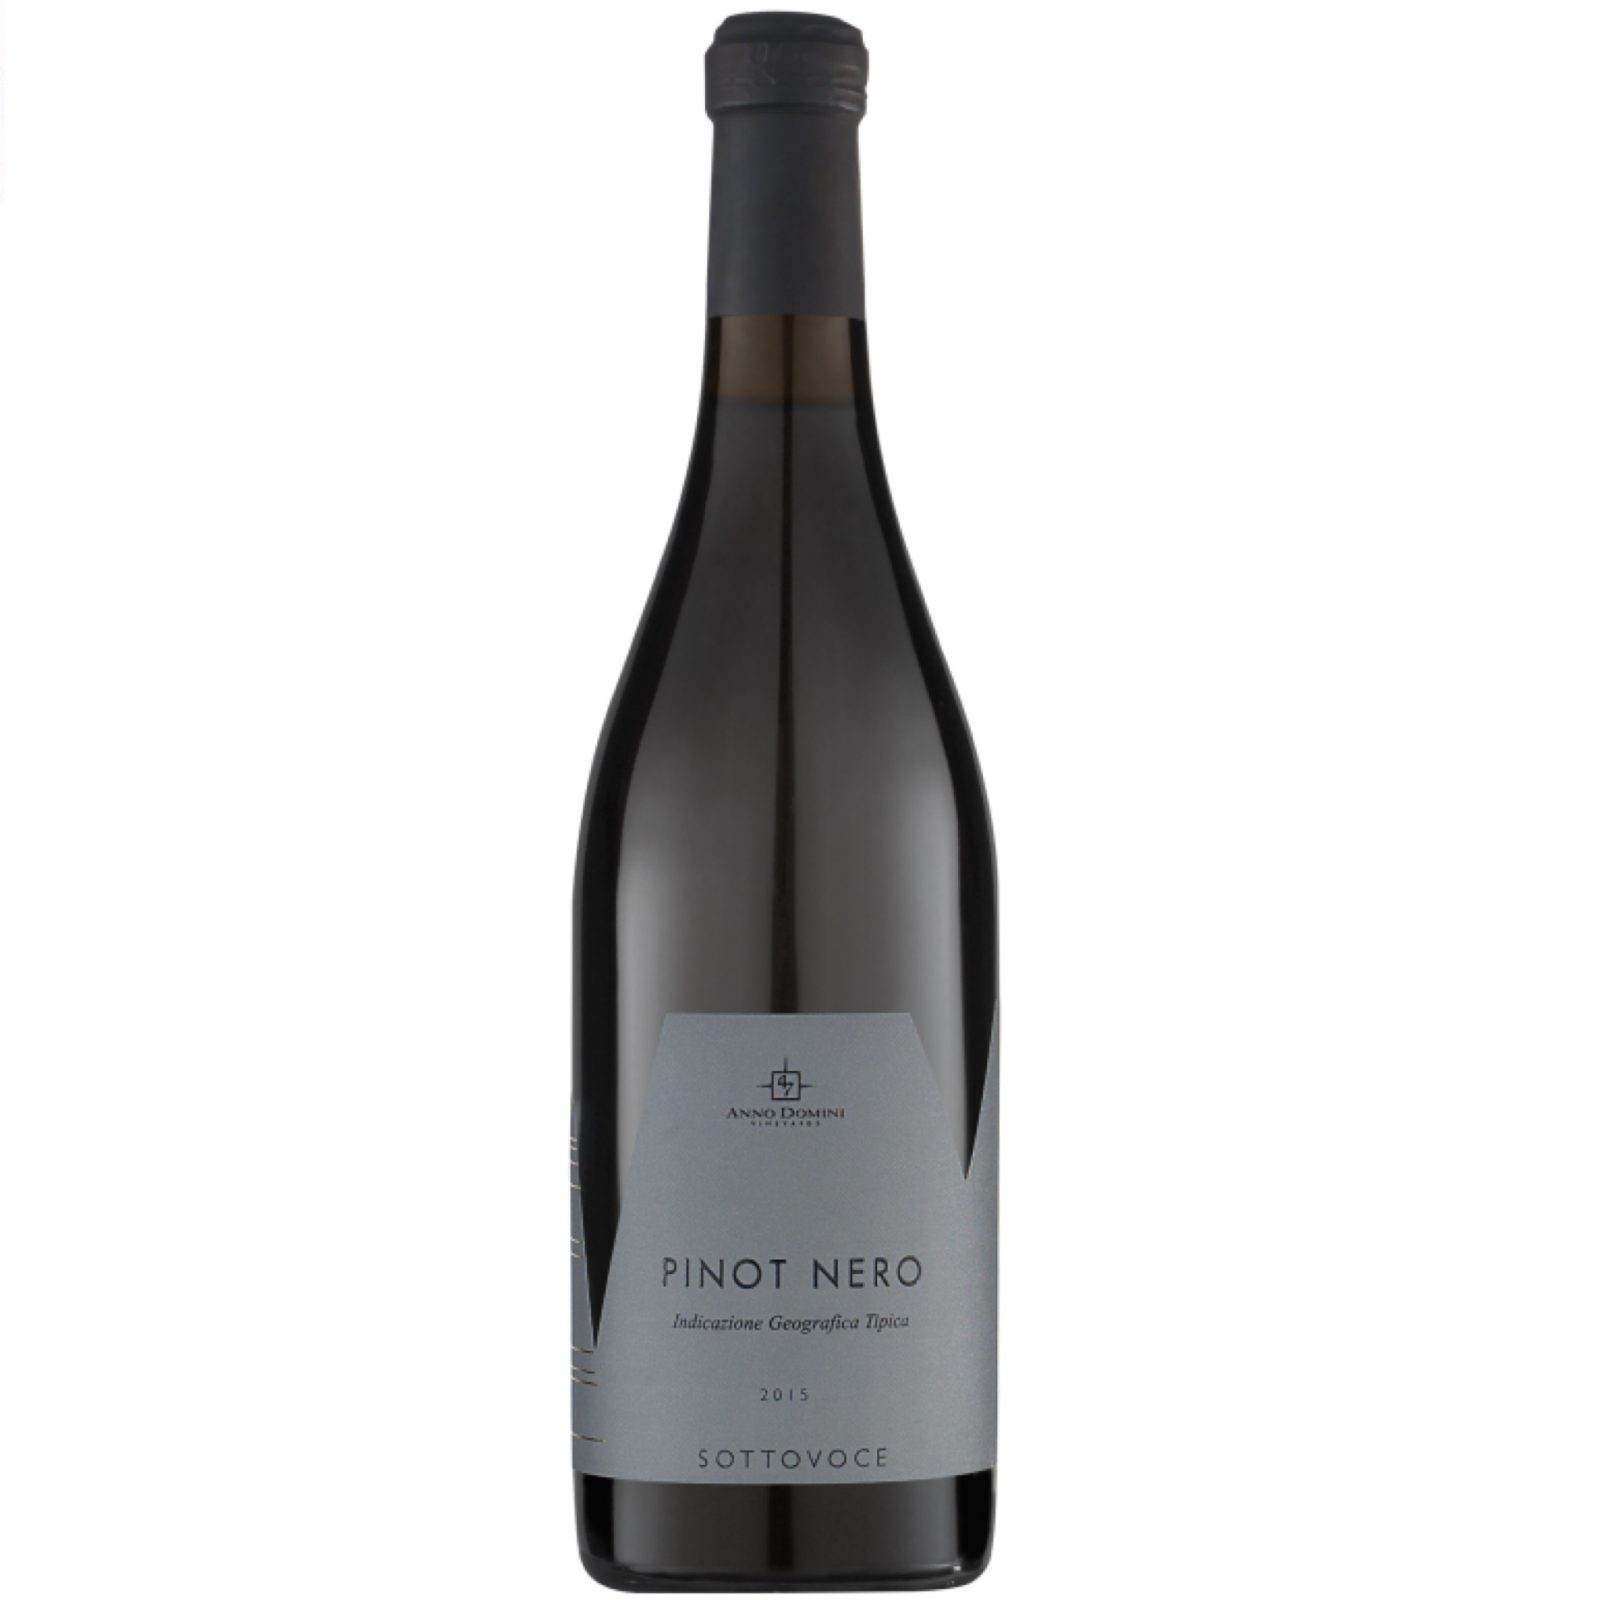 47-Anno-Domini-Pinot-Nero-Sottovoce-wijn-van-ons